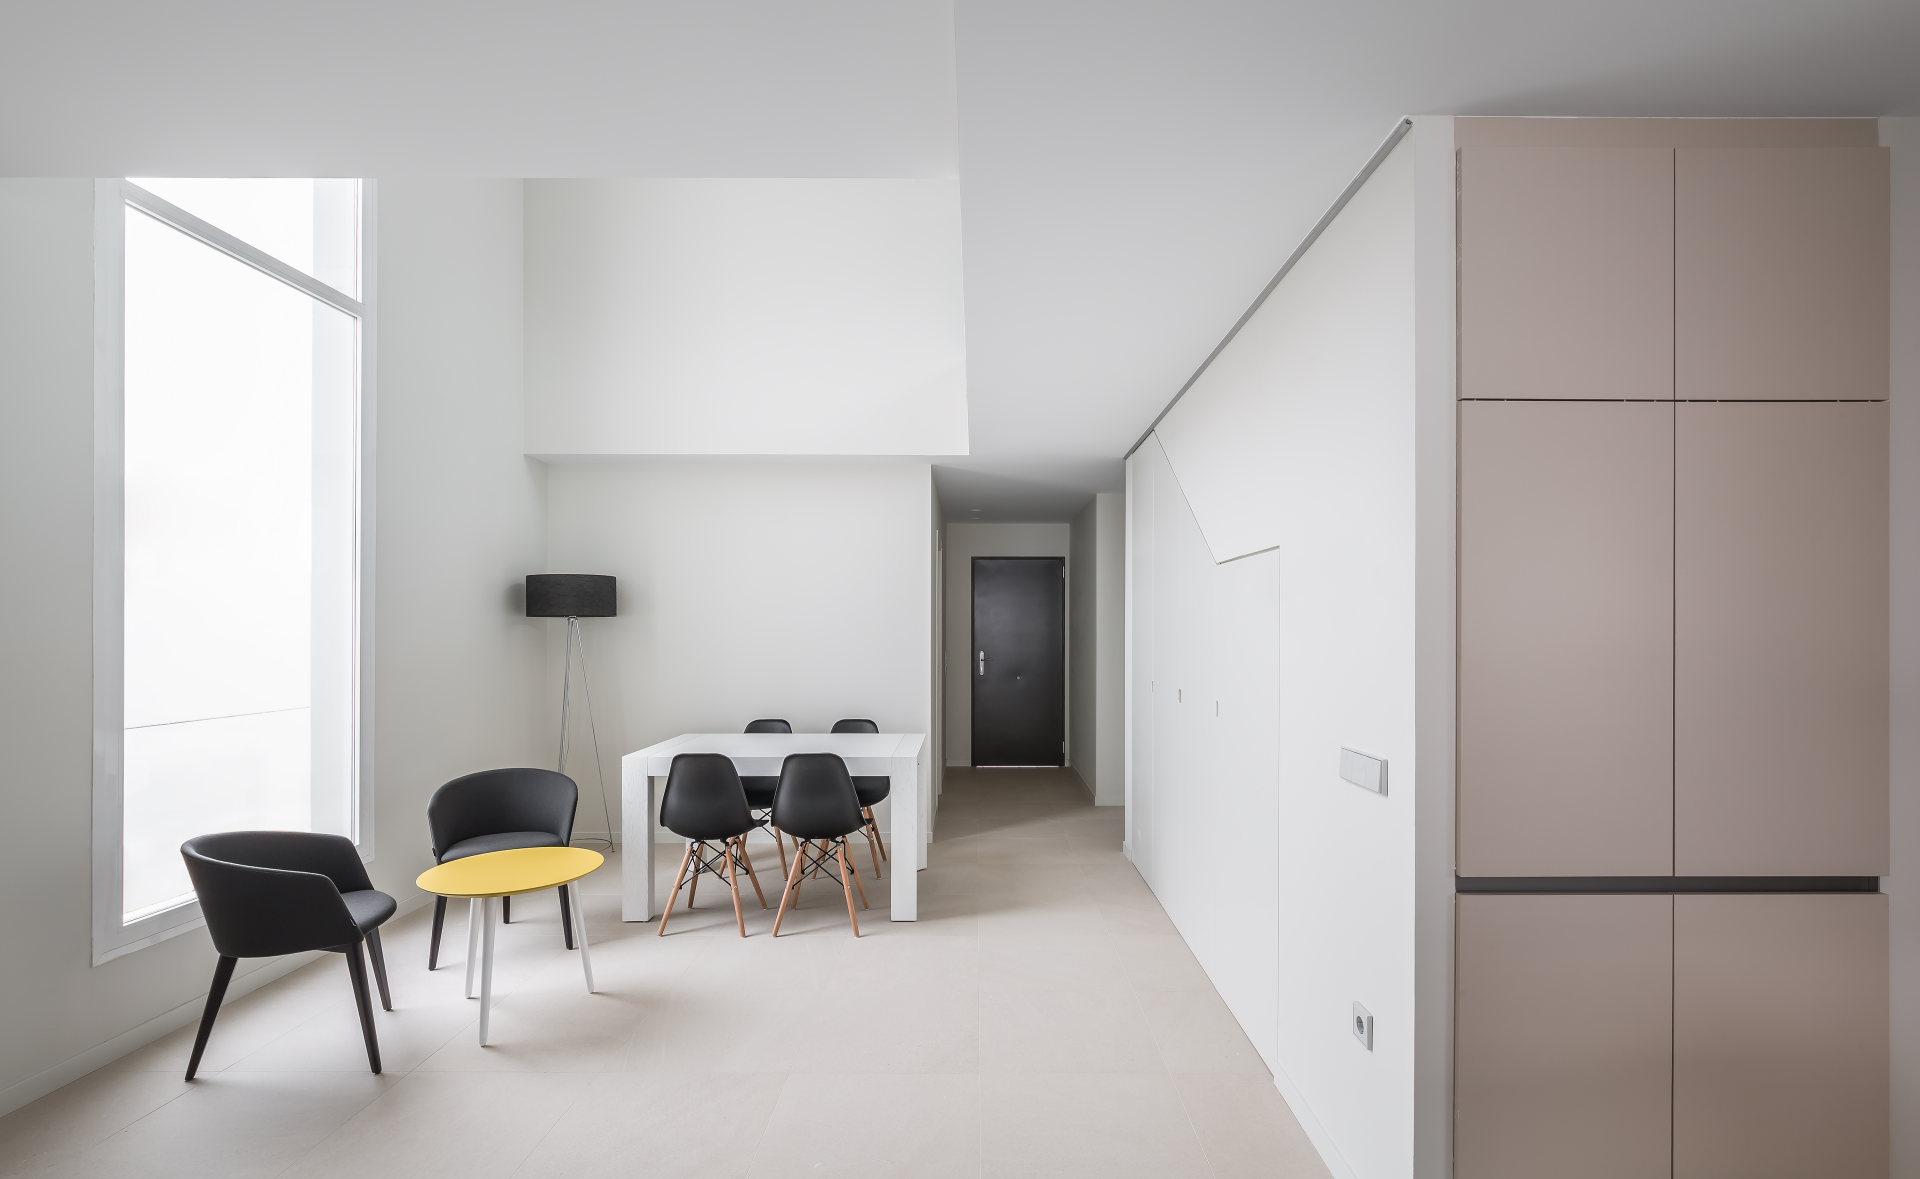 fotografia-arquitectura-valencia-german-cabo-viraje-san-antonio (16)